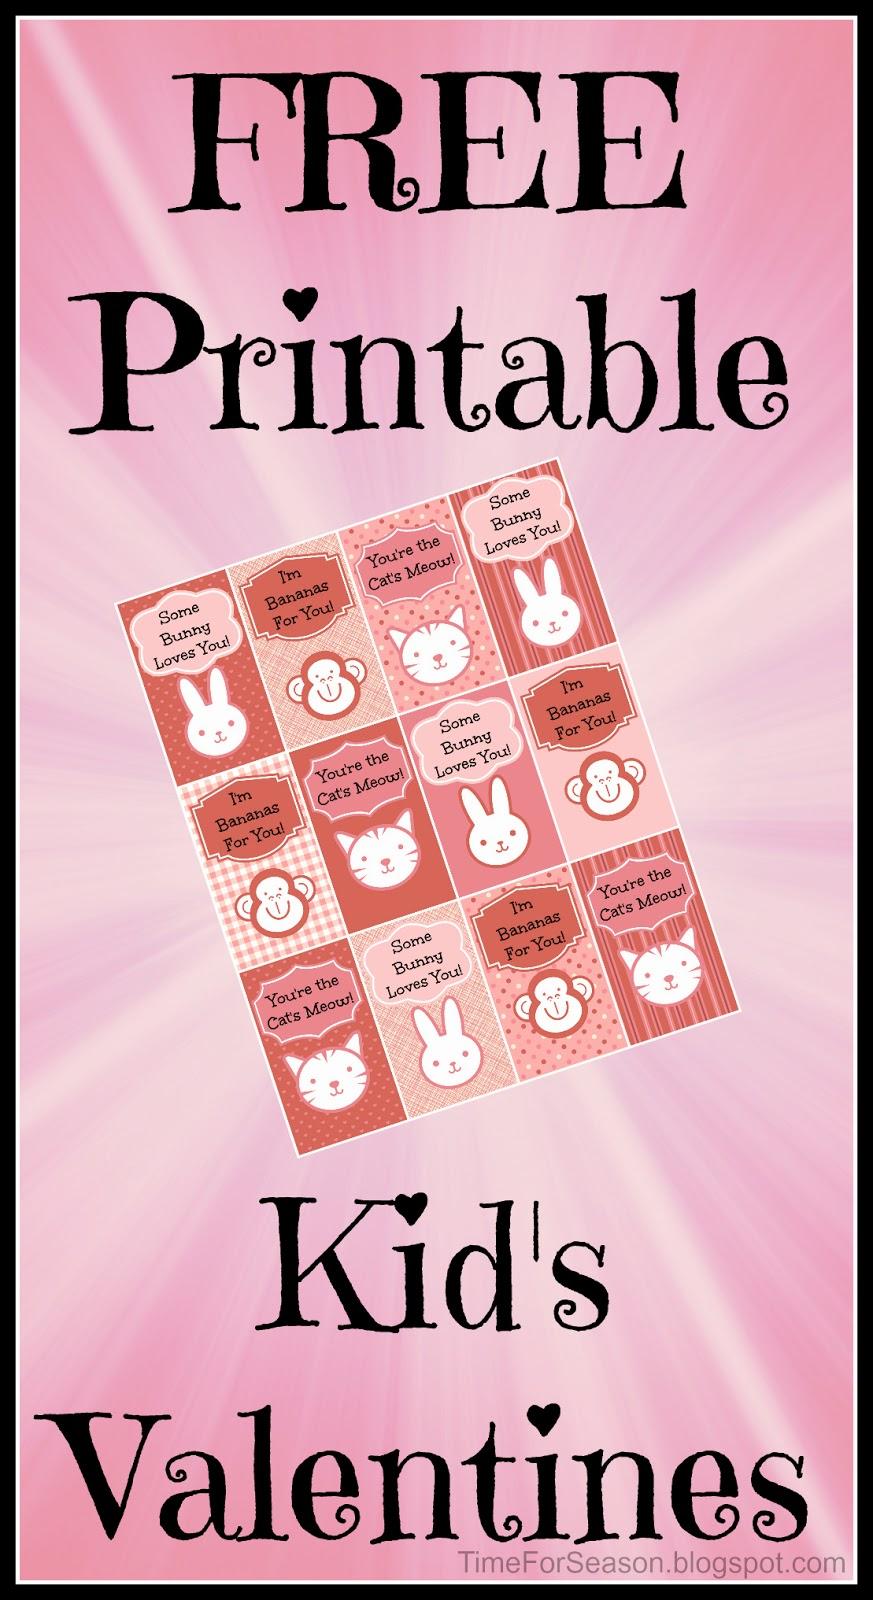 http://timeforseason.blogspot.com/2015/02/free-printable-kids-valentines.html